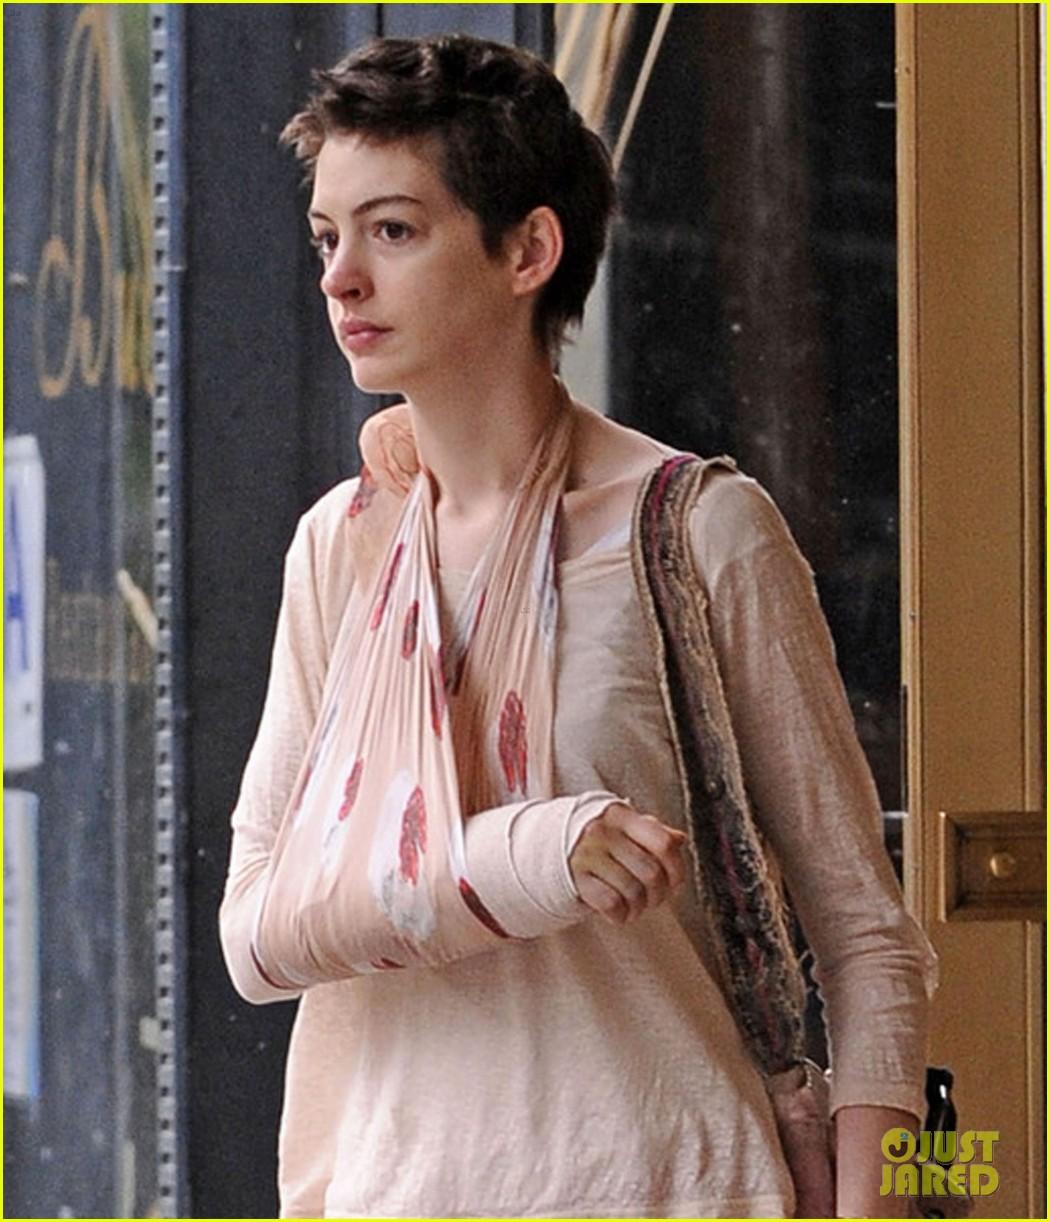 Anne Hathaway 2012 I - FONDOS WALL Shakira Wikipedia